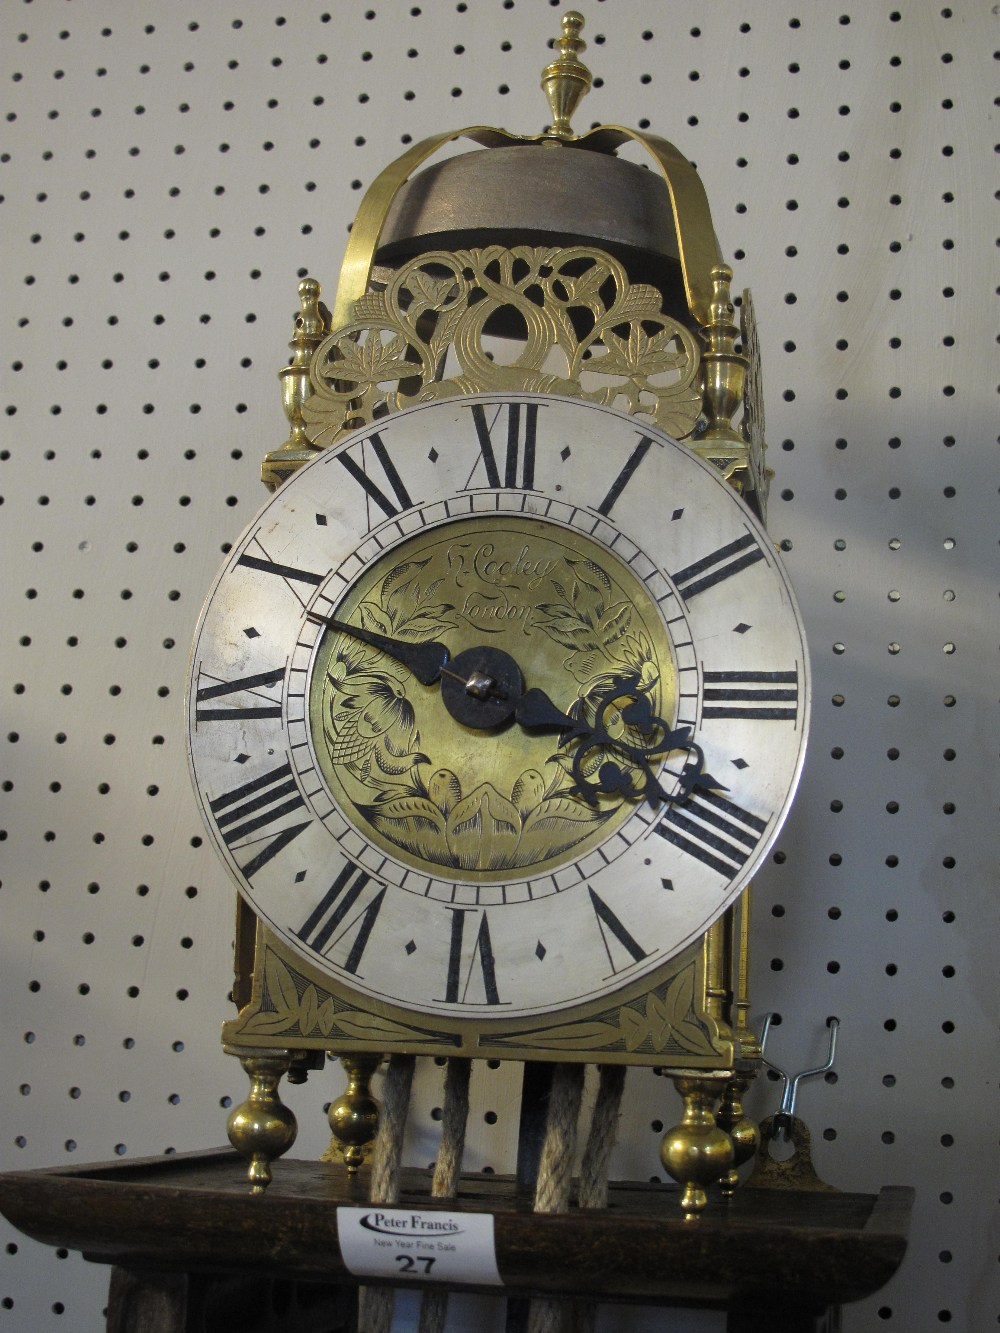 17TH CENTURY STYLE BRASS LANTERN CLOCK t - Image 2 of 5